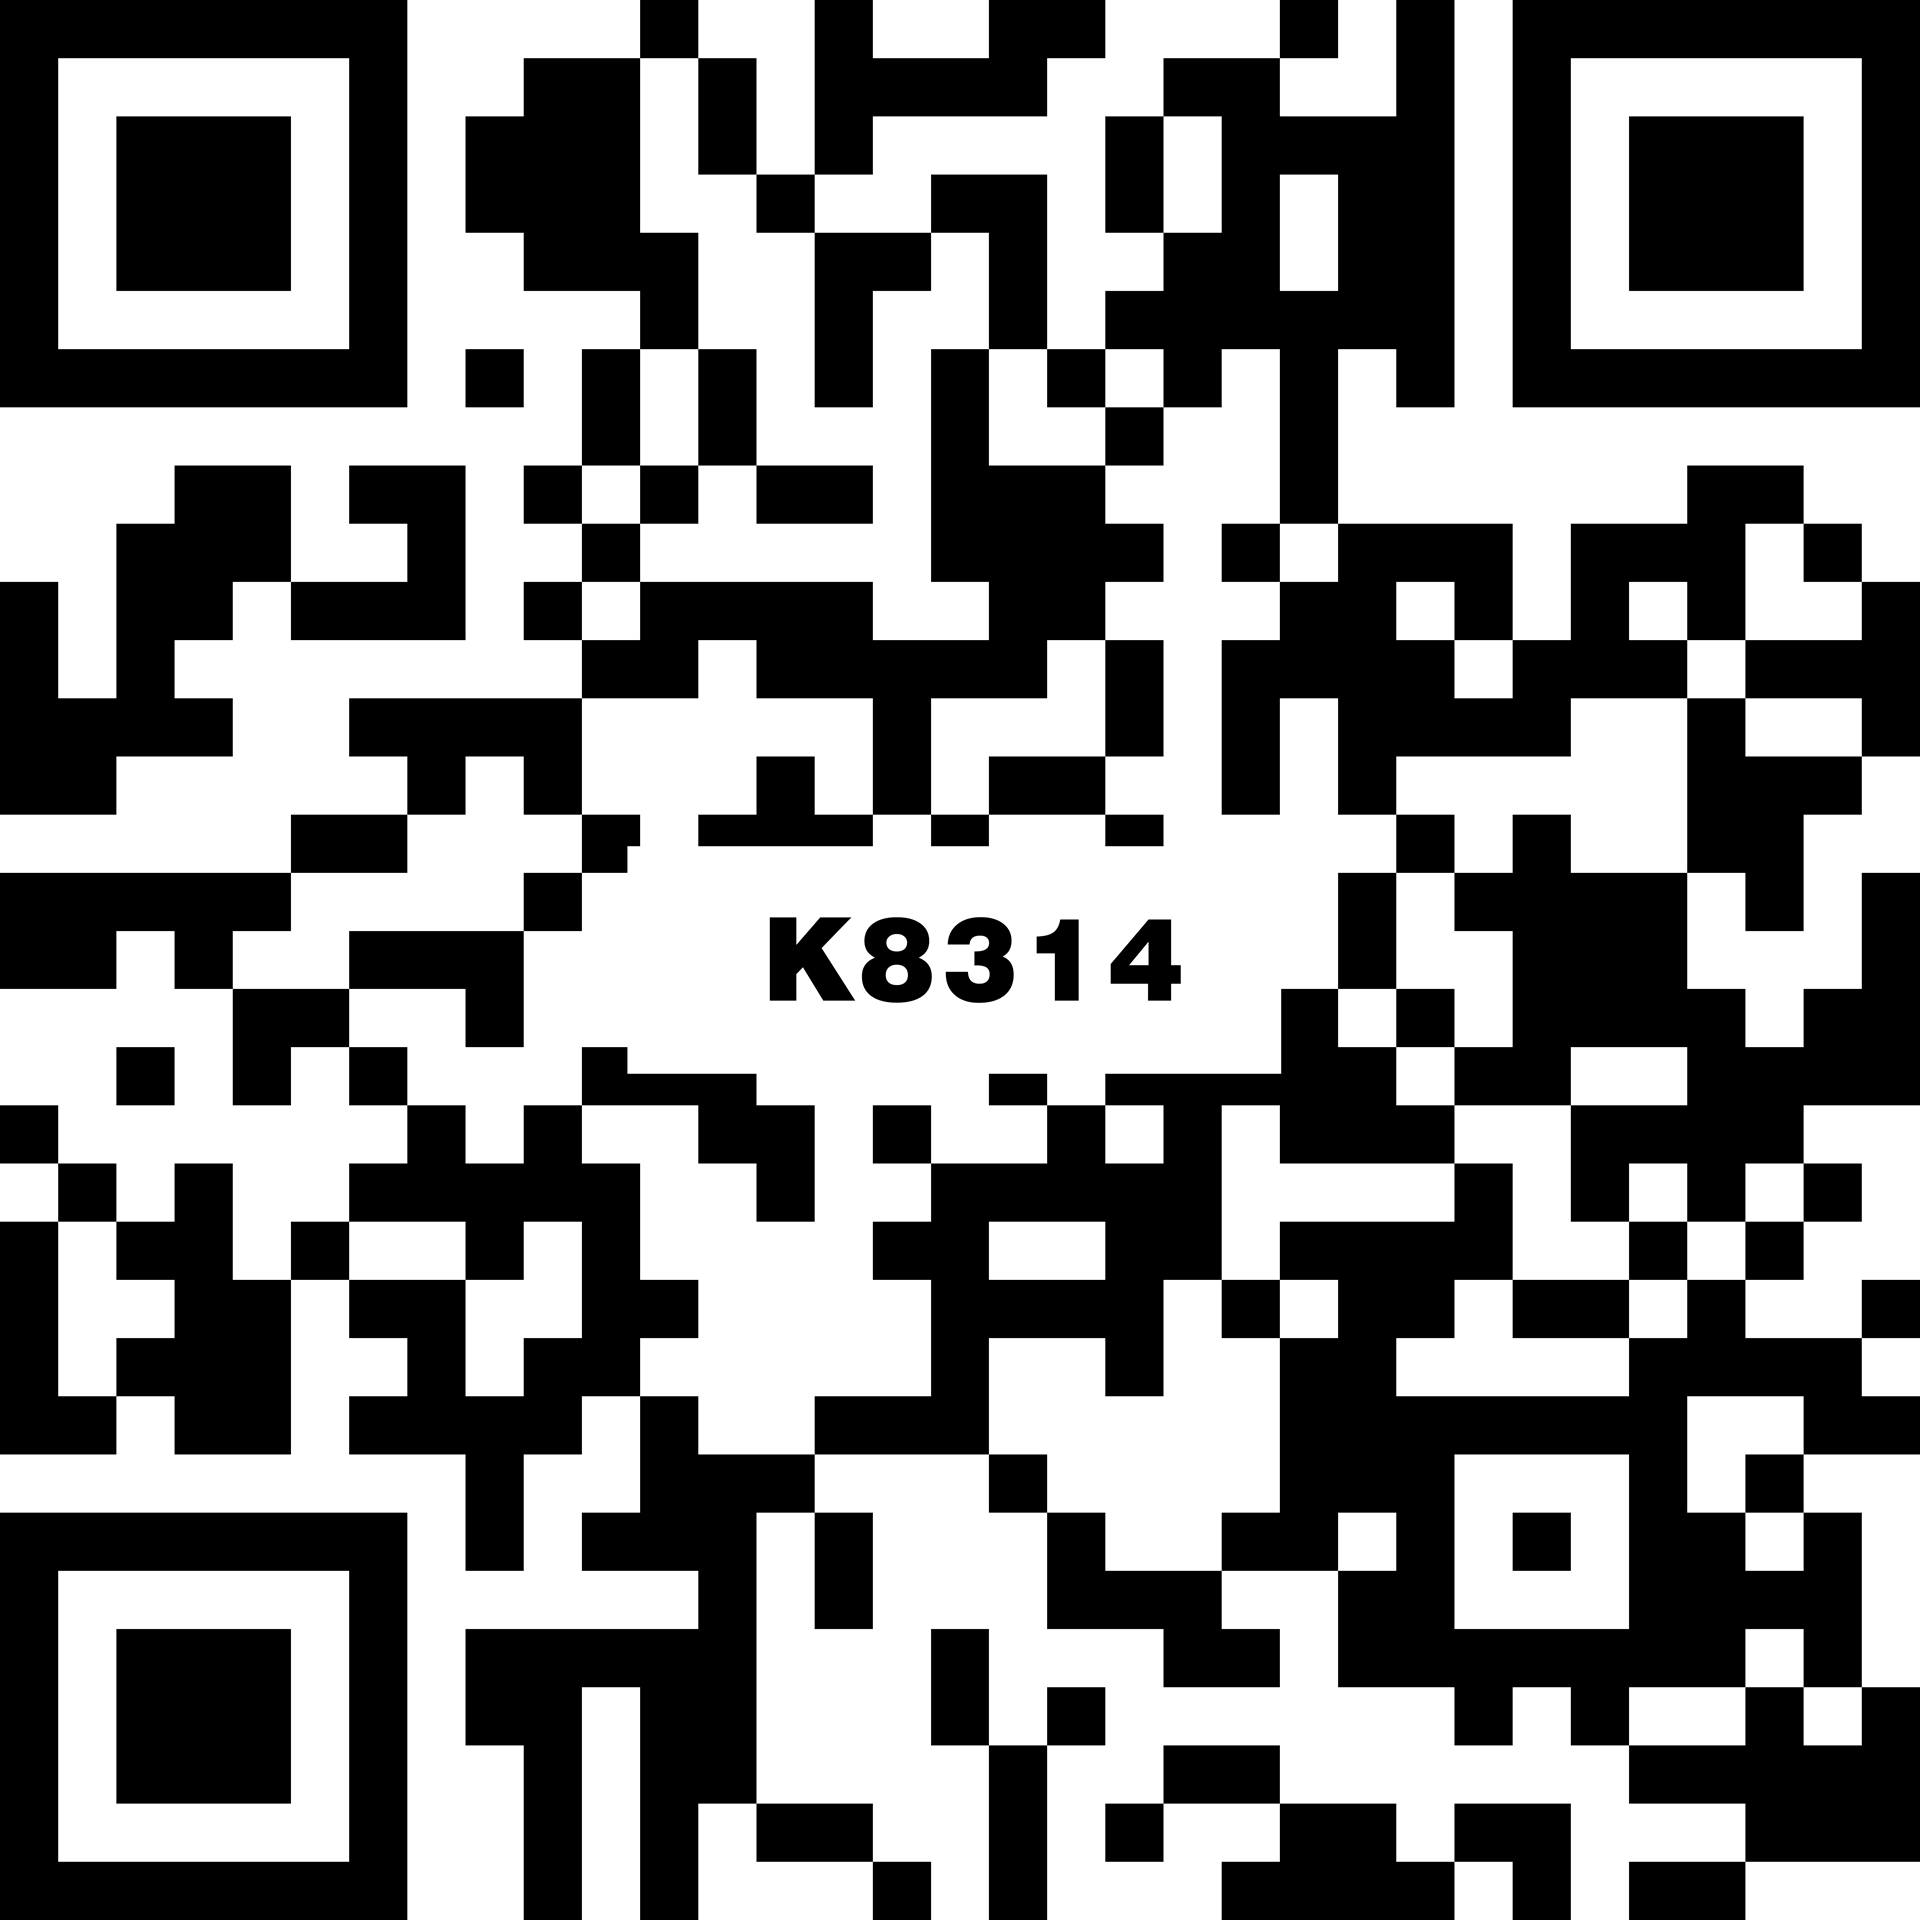 K8314